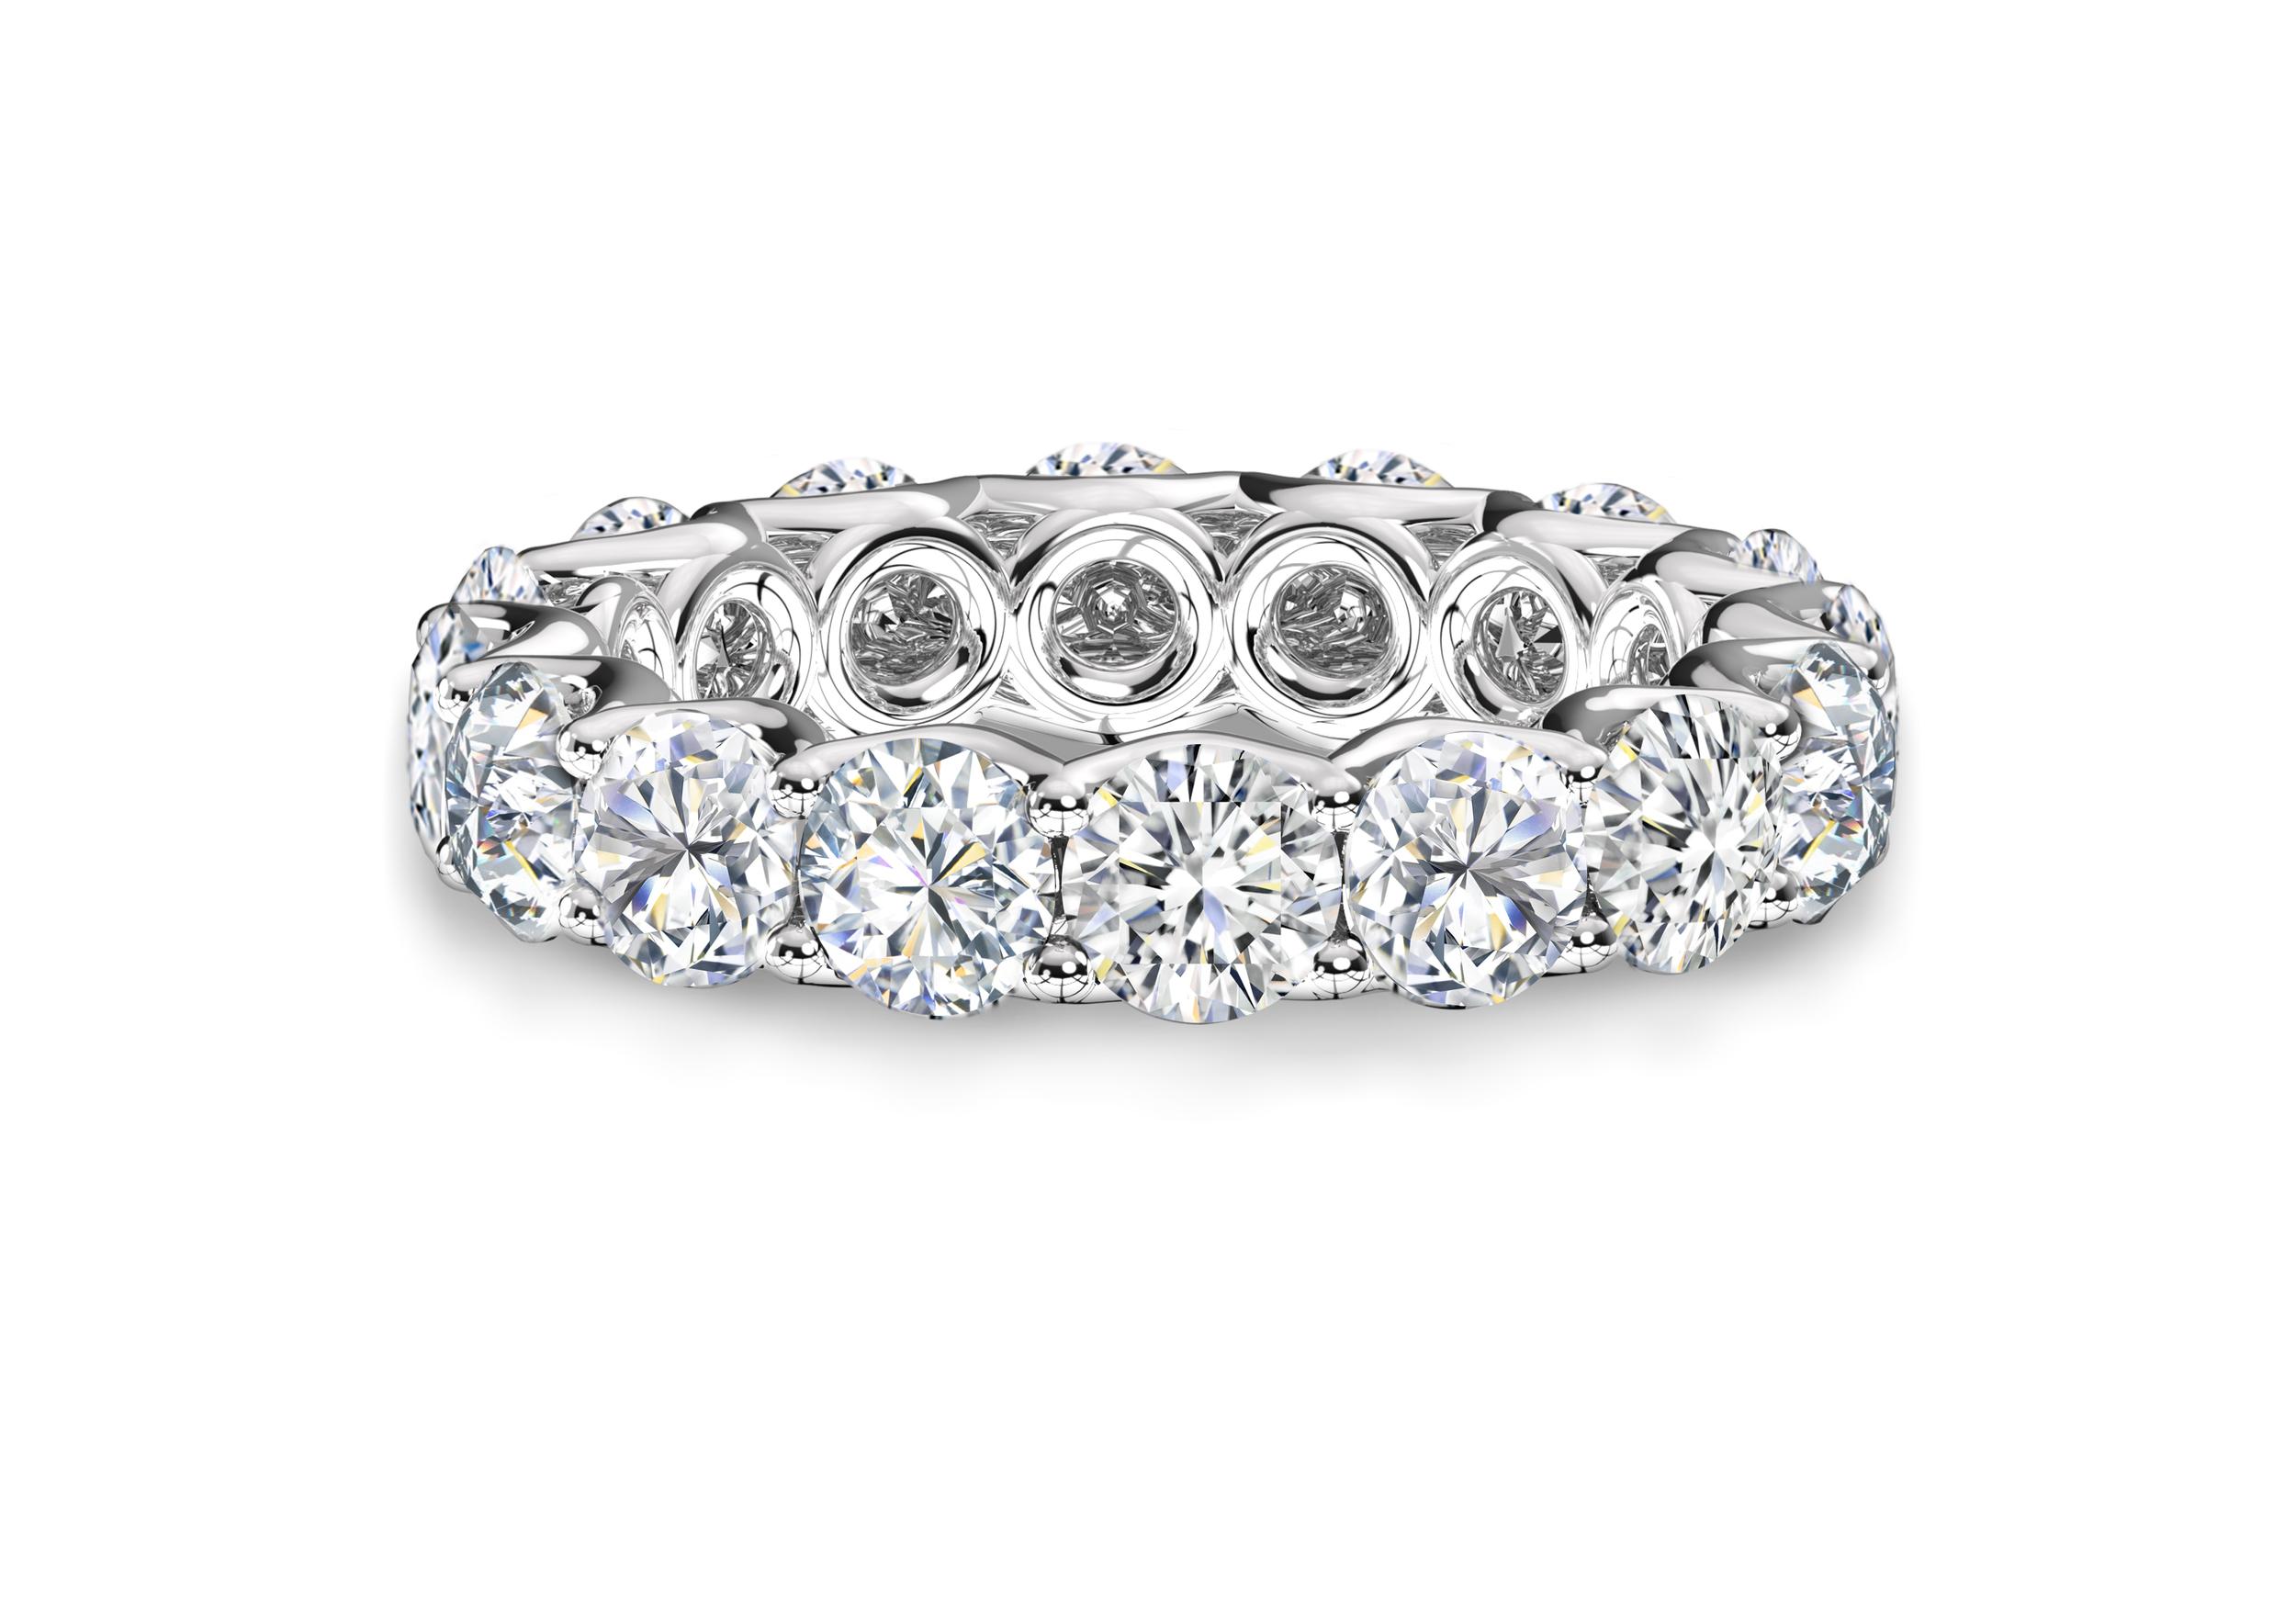 Copy of Forevermark | Camarillo, CA Jewelers | Van Gundys